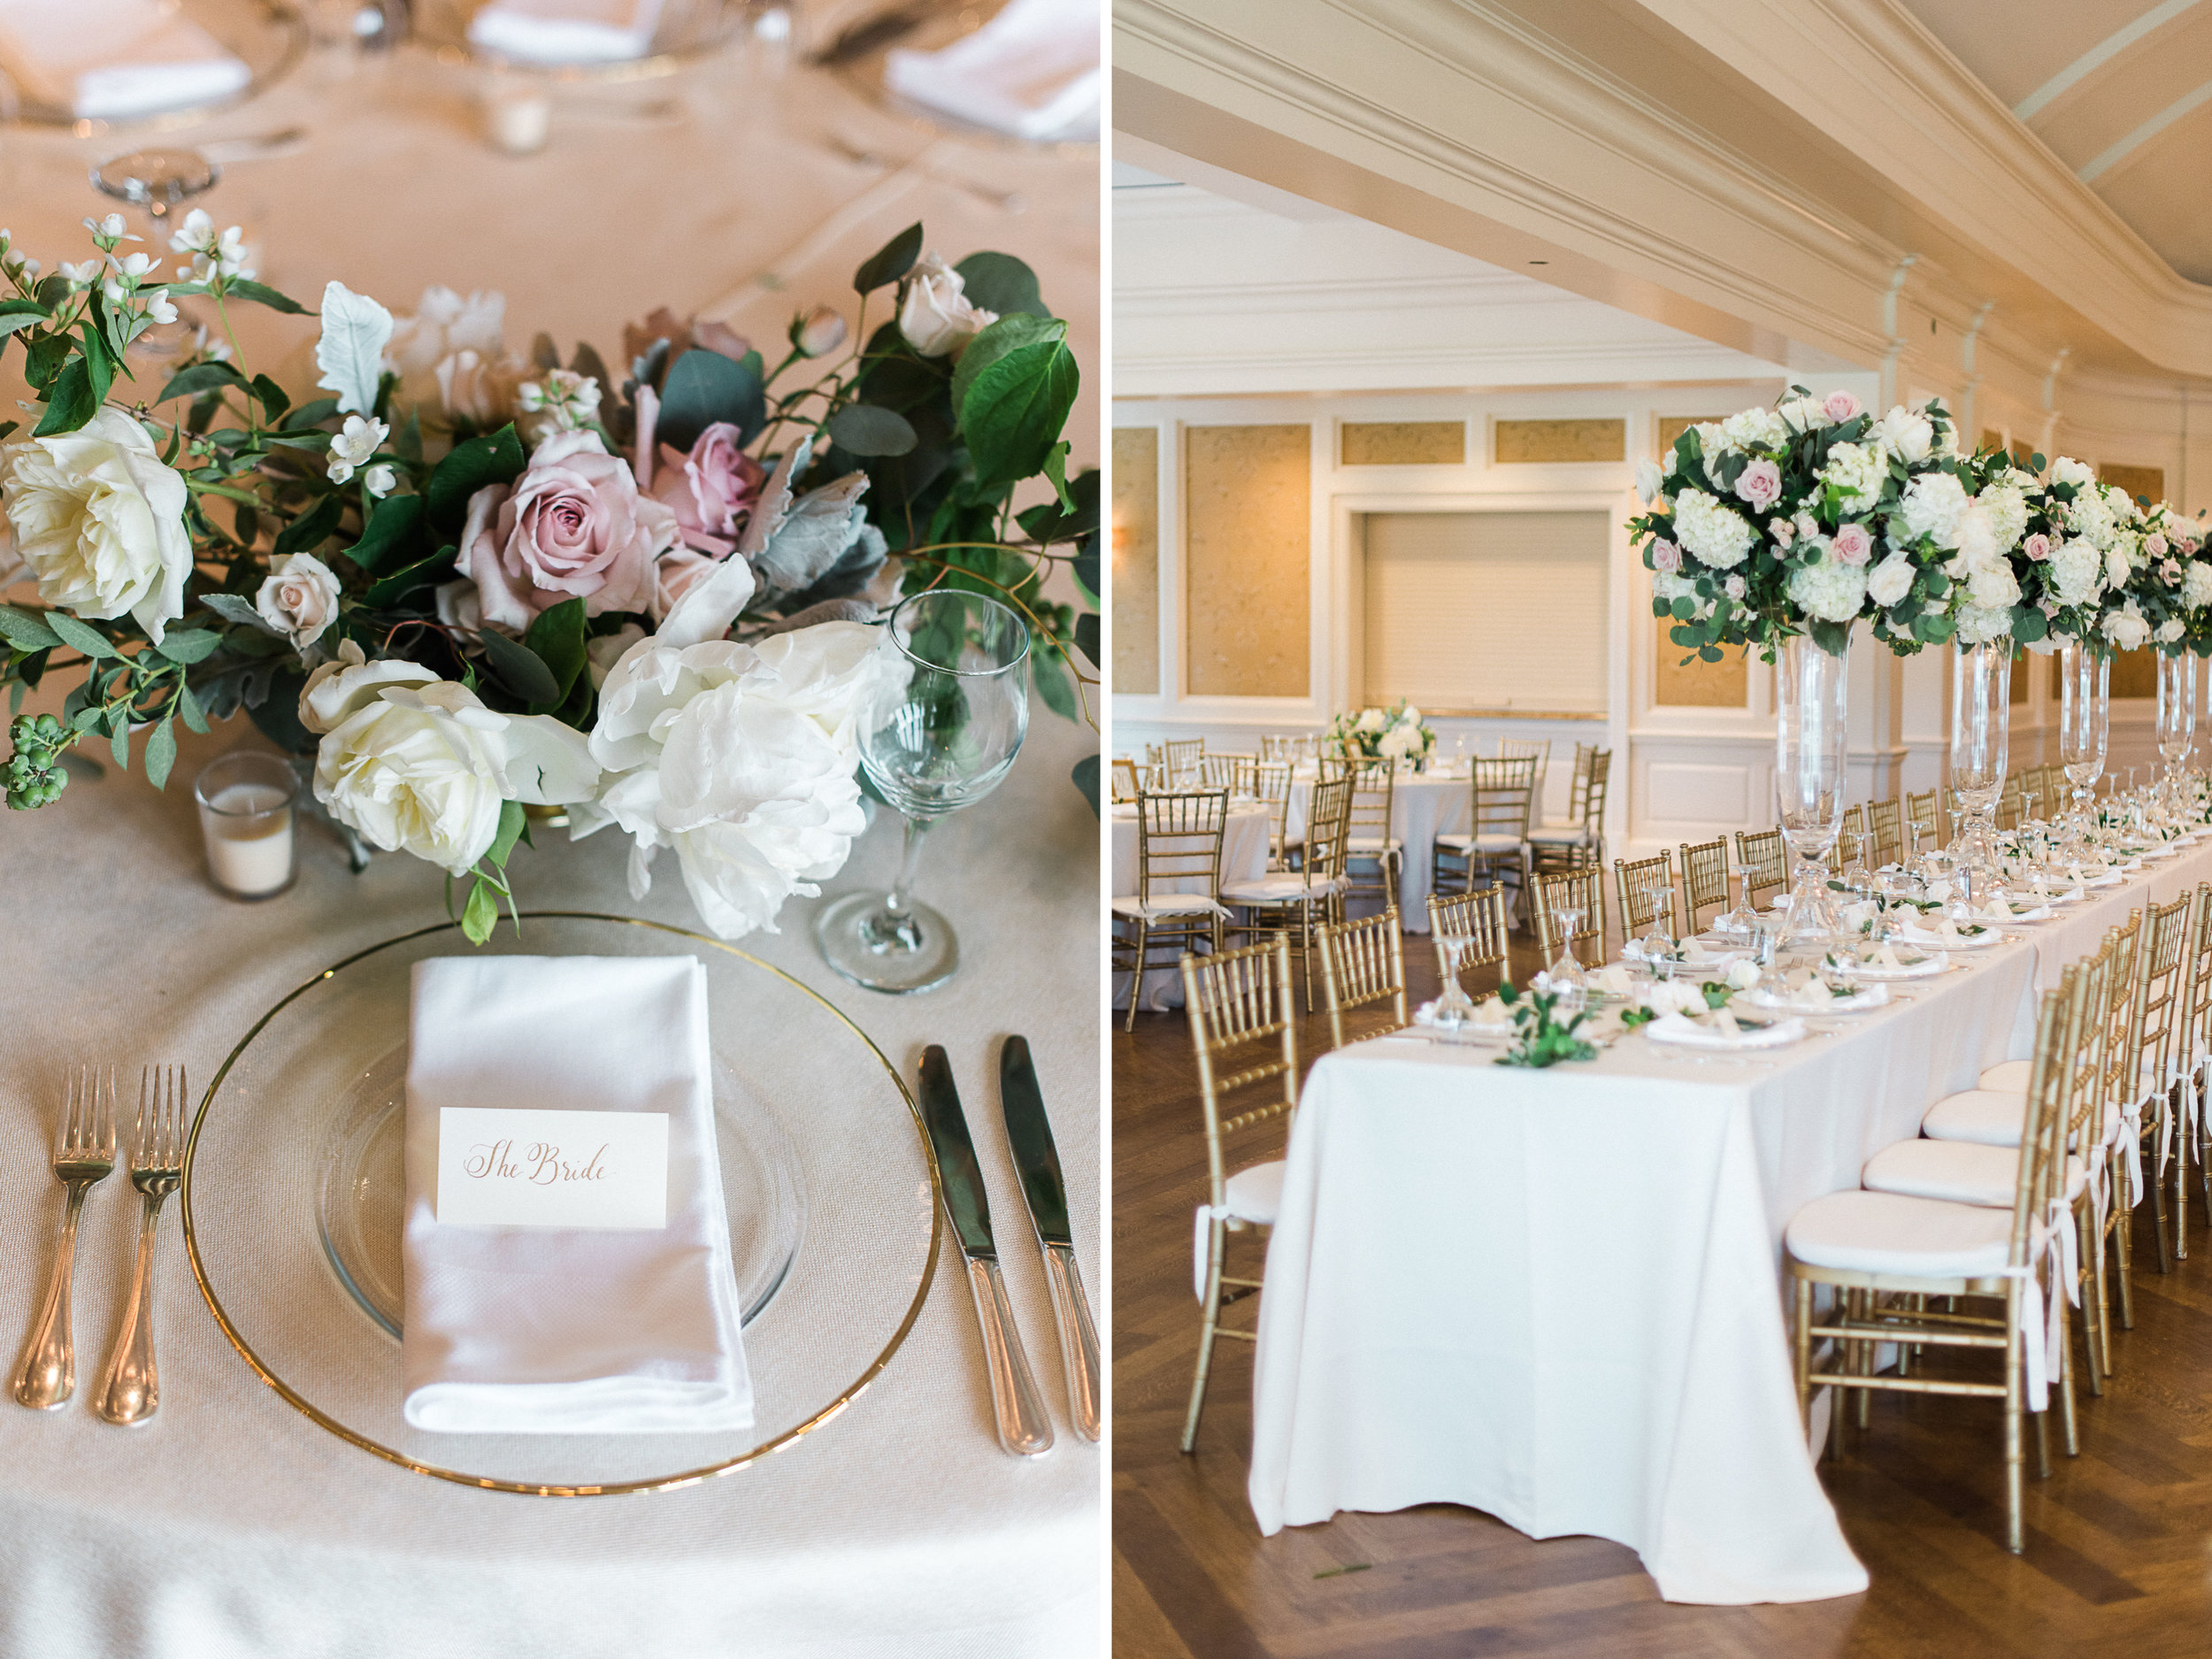 Fine-Art-Film-Houston-Wedding-Photographer-Best-Top-Luxury-Texas-Austin-Dallas-Destination-Dana-Fernandez-Photography-River-Oaks-Country-Club-South-Main-Baptist-Ceremony-Reception-Wedding-110.jpg